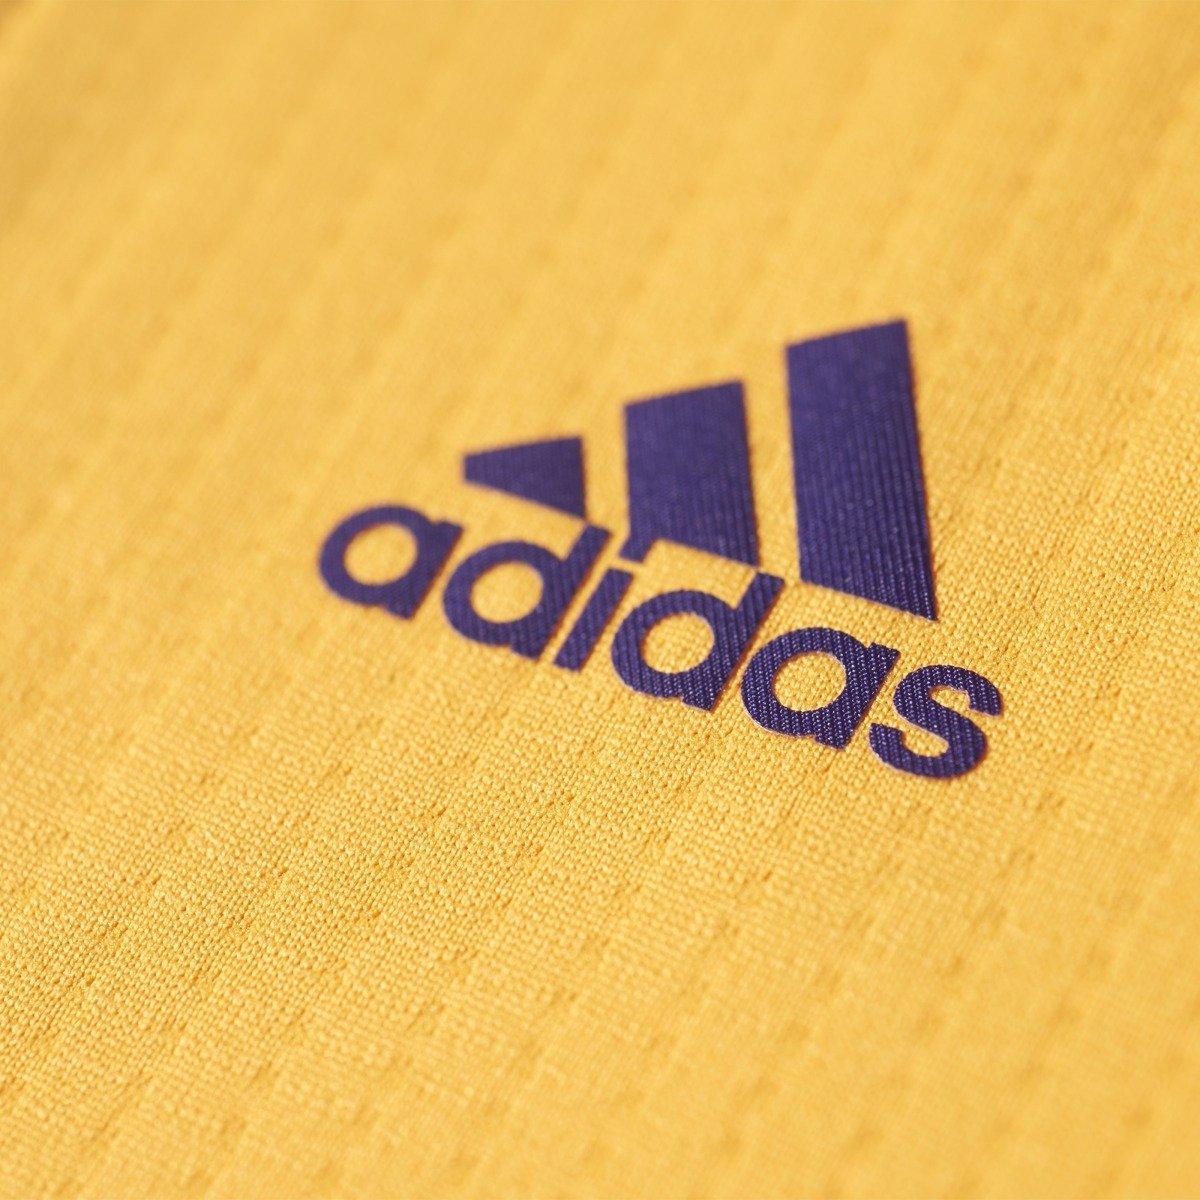 vjitmv Adidas NBA Los Angeles Lakers Kobe Bryant Swingman Jersey - A45978